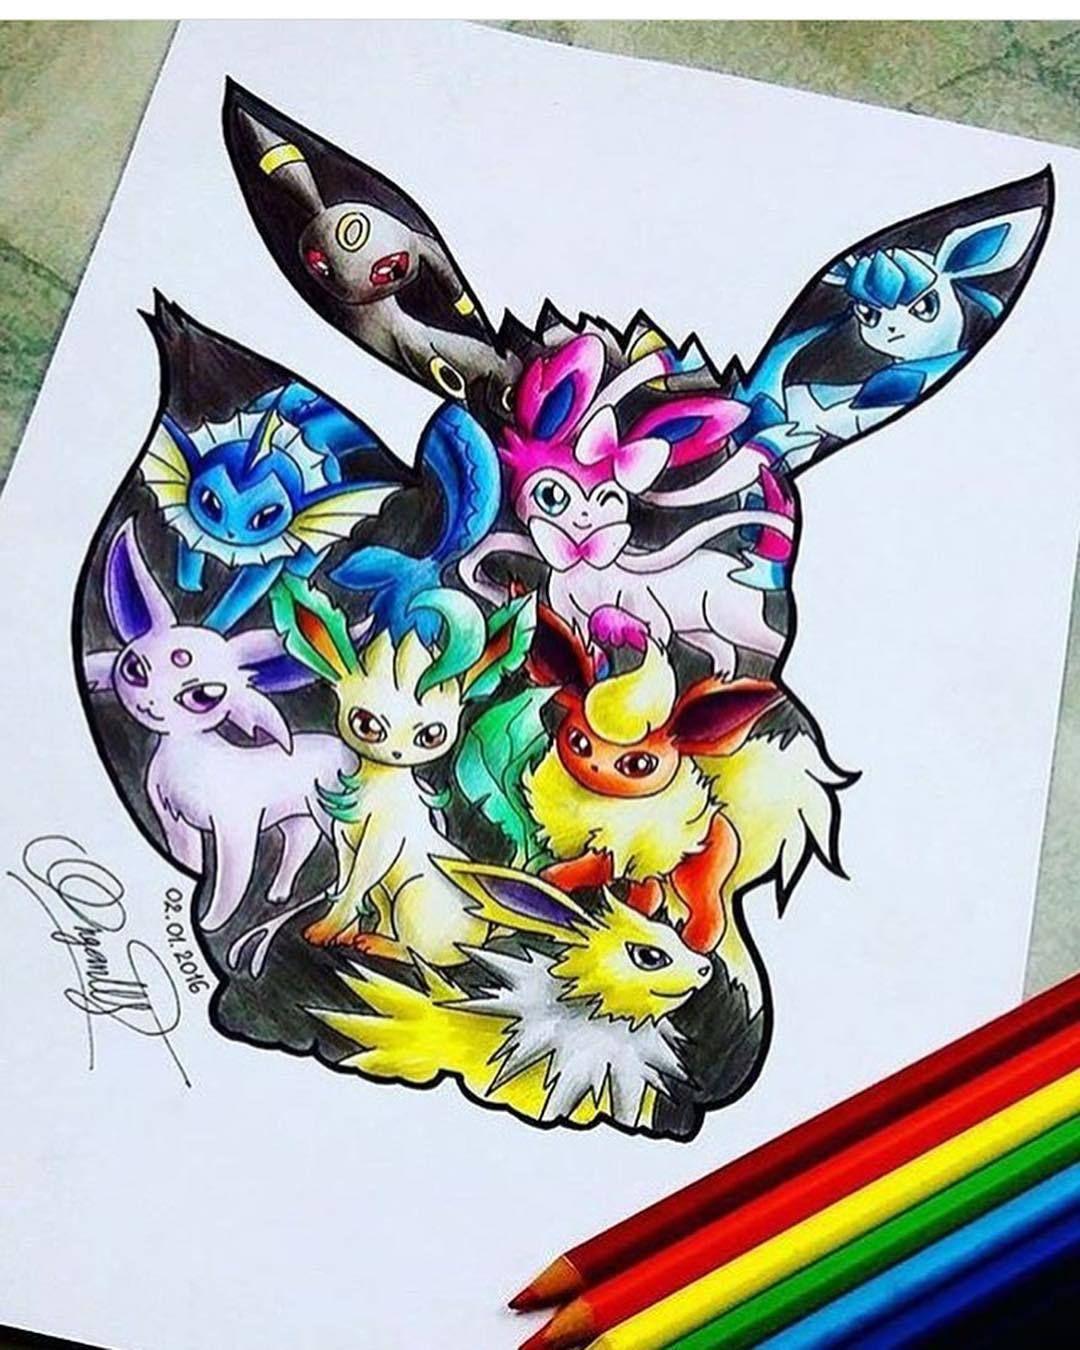 Arquivos Pokémon - Burn Book